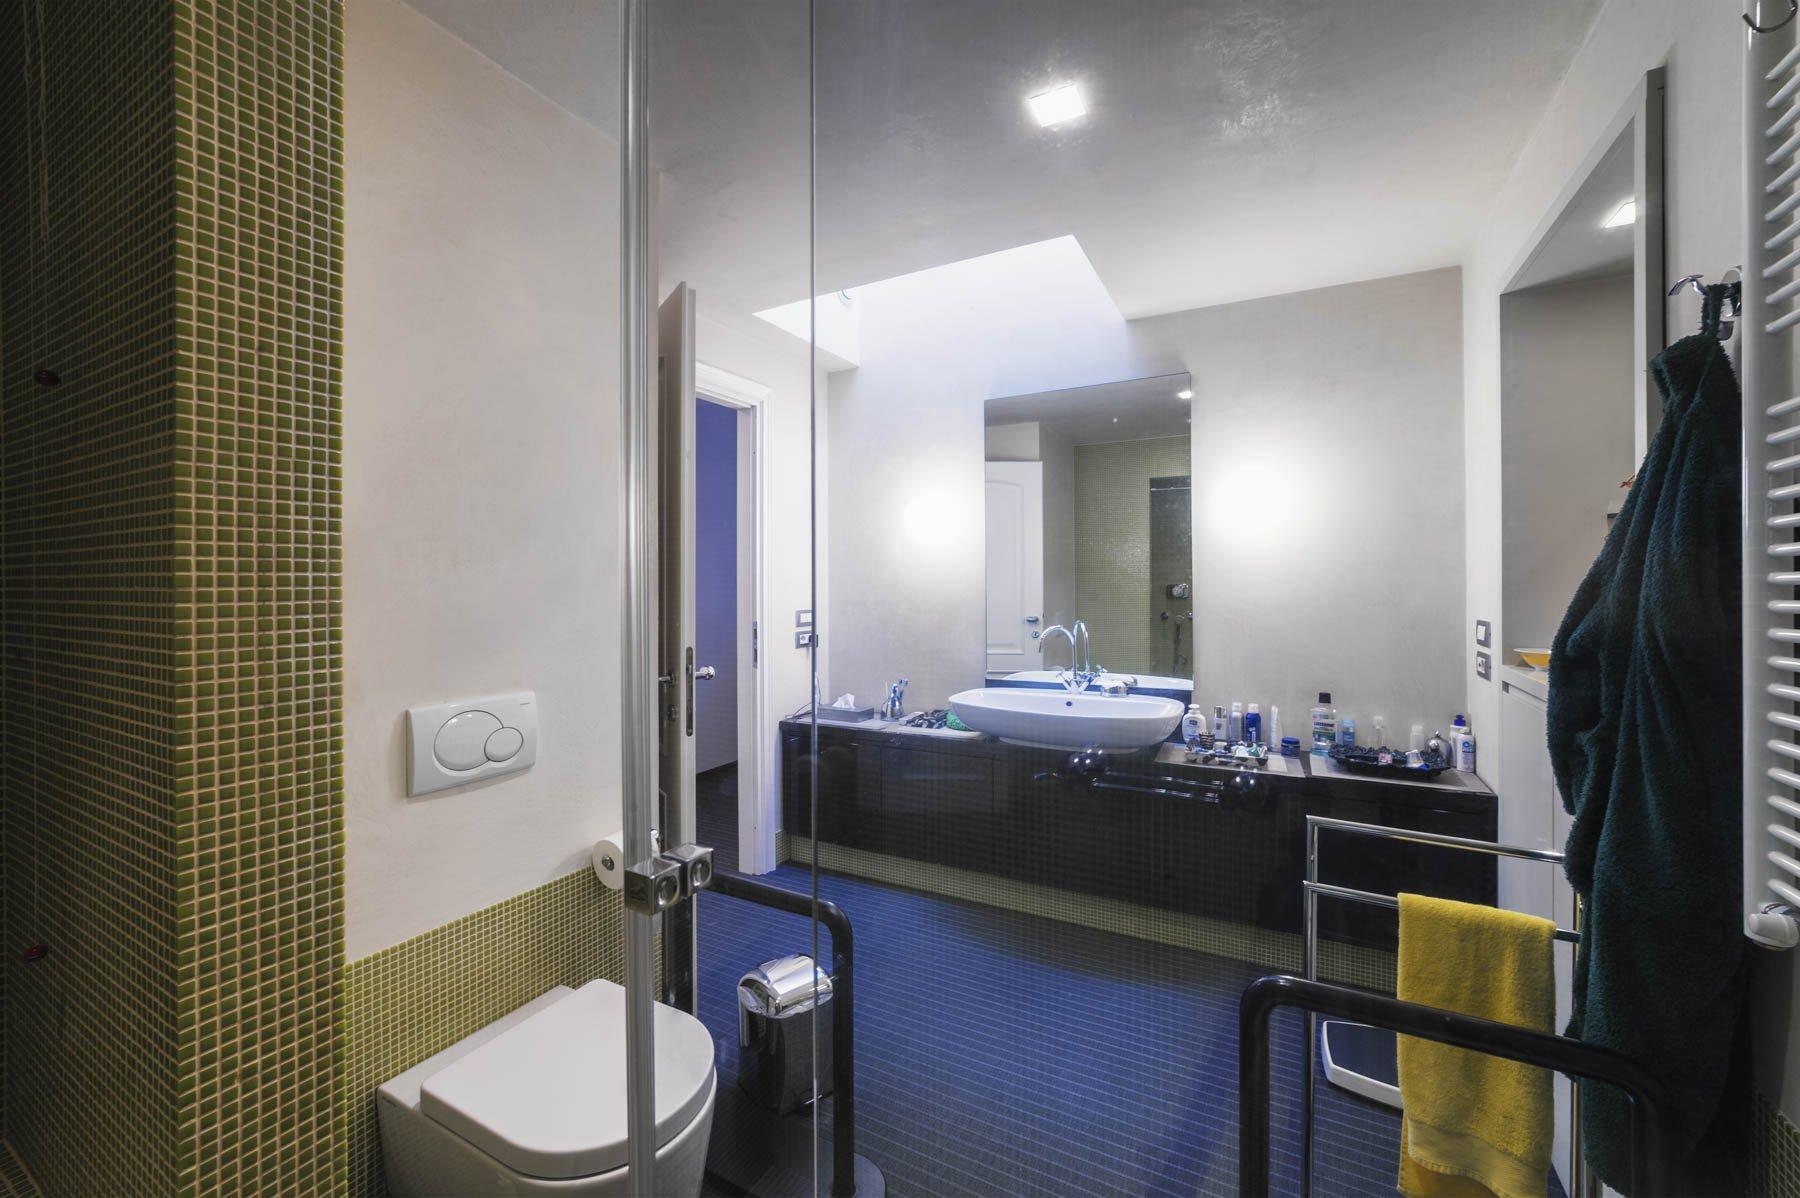 Apartment for sale in Baveno, inside a historic lake front villa - bathroom